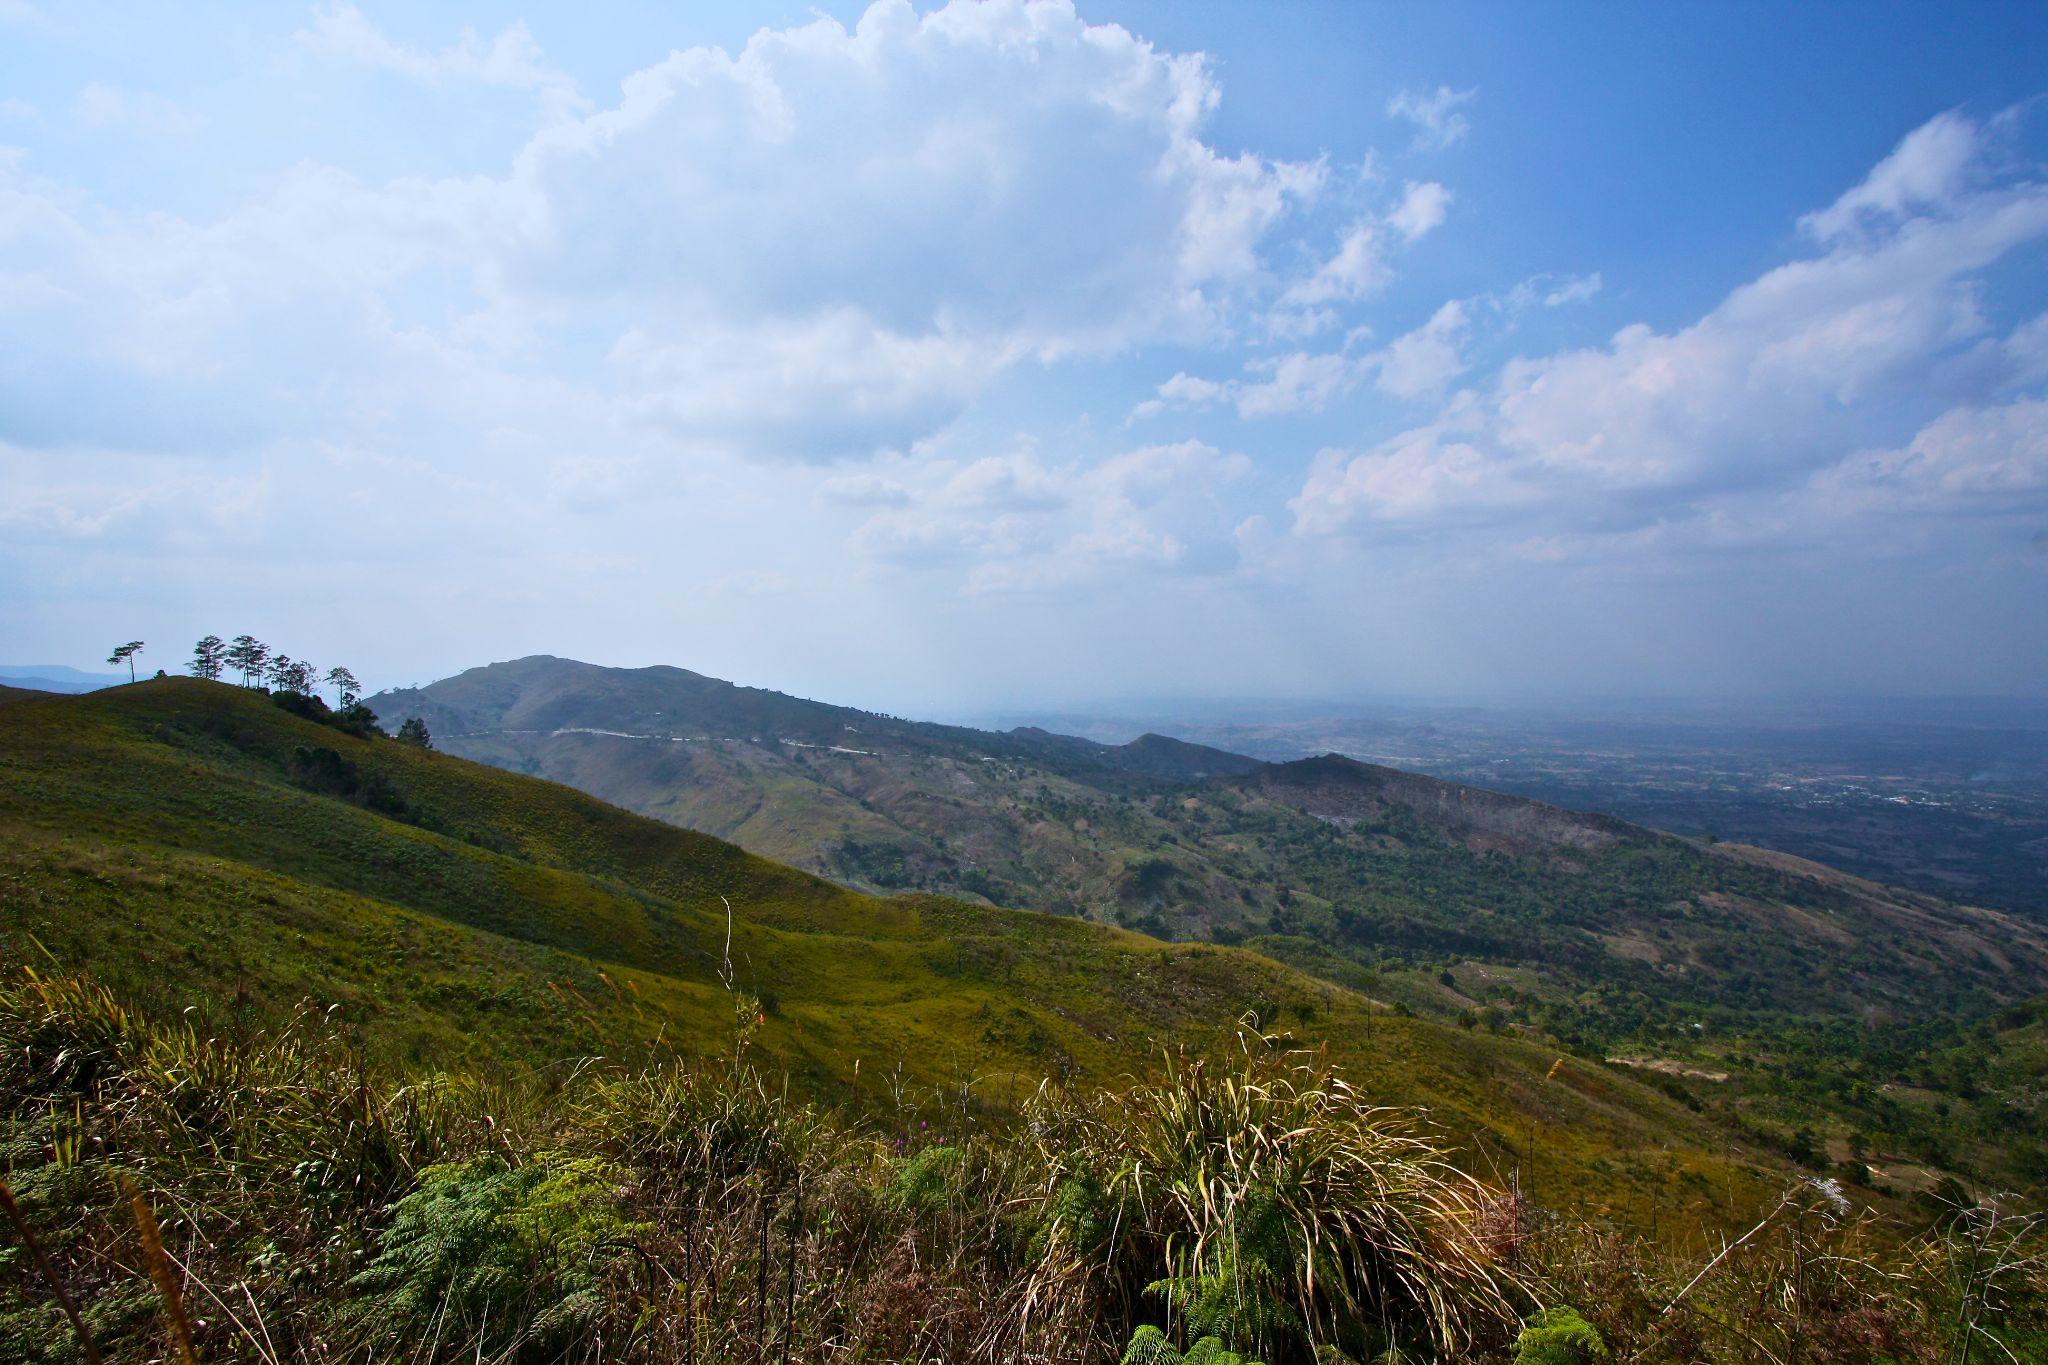 Haitian Mountains by Hugh Mitchell